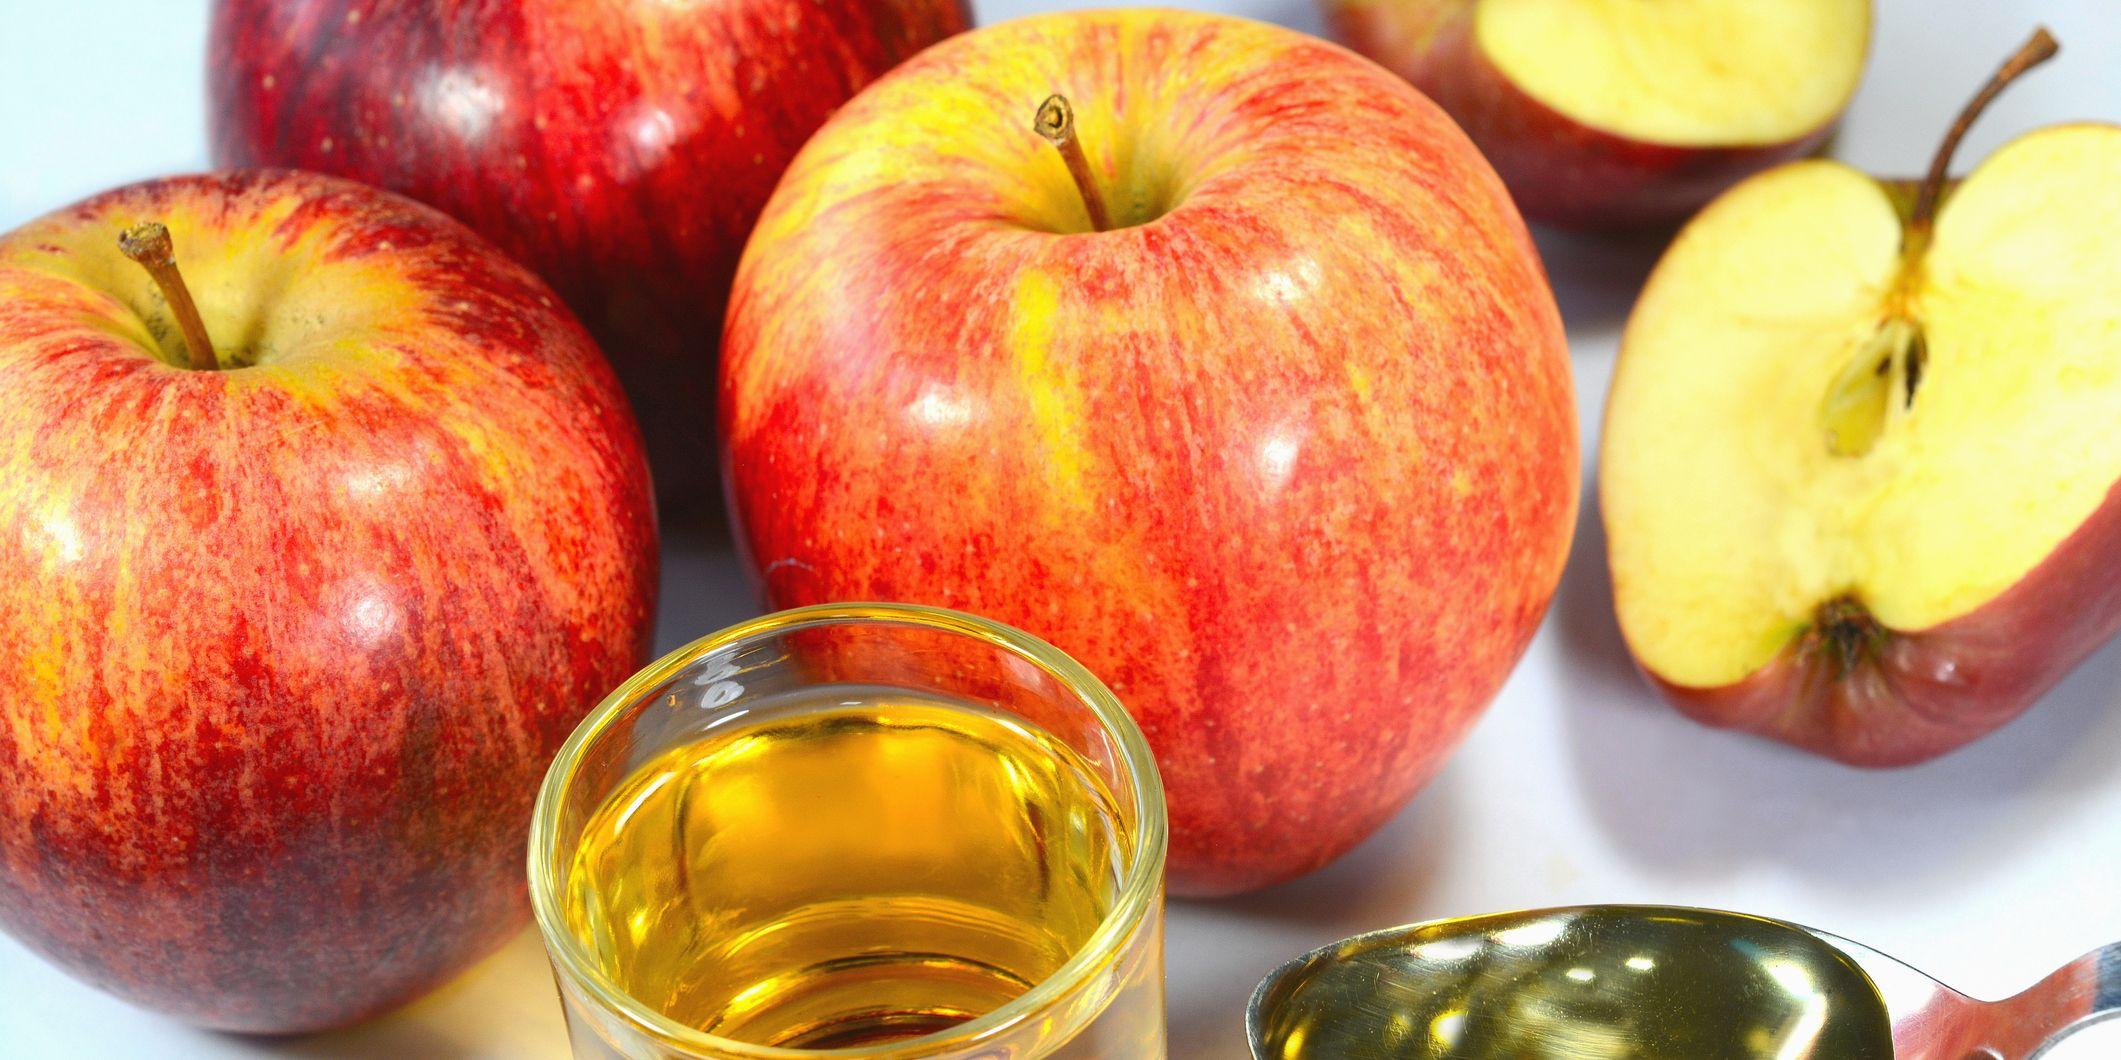 5 Ways That Apple Cider Vinegar Could Benefit Your Health